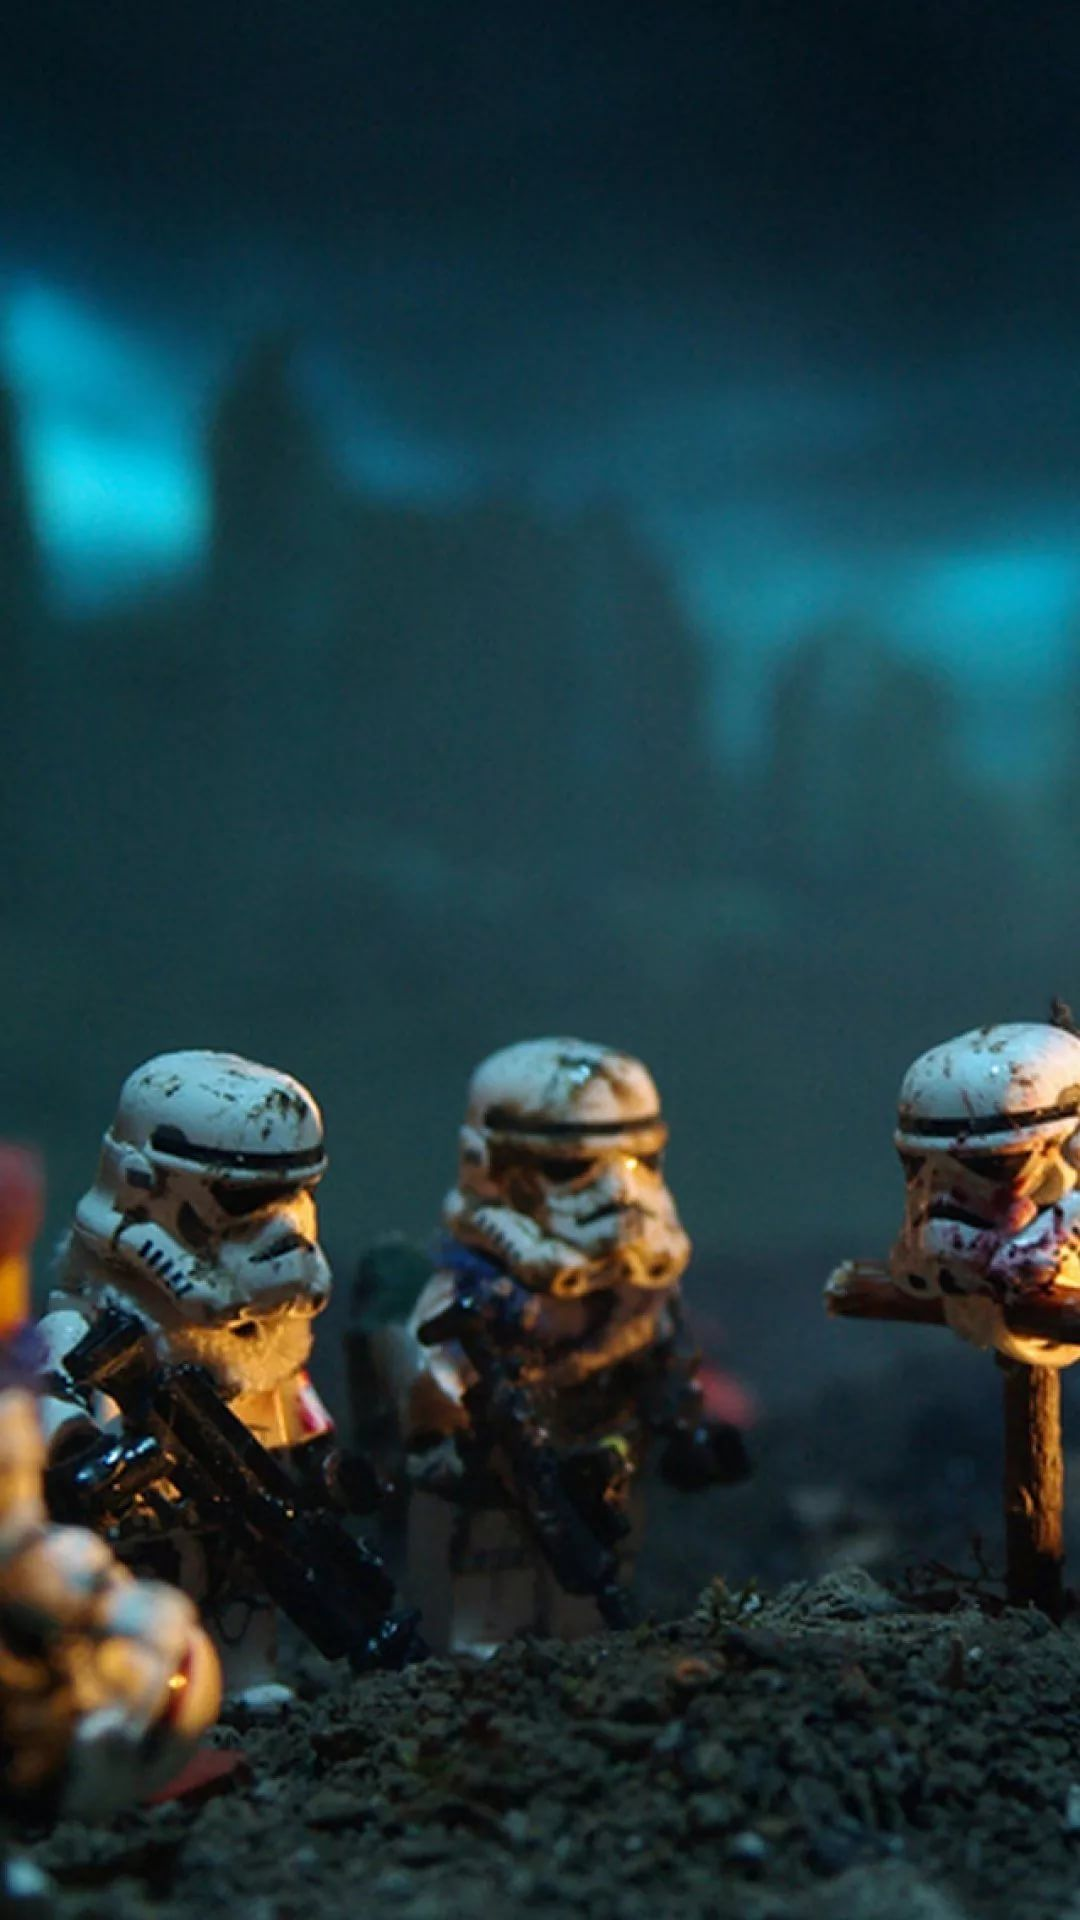 Lego Star Wars hd wallpaper